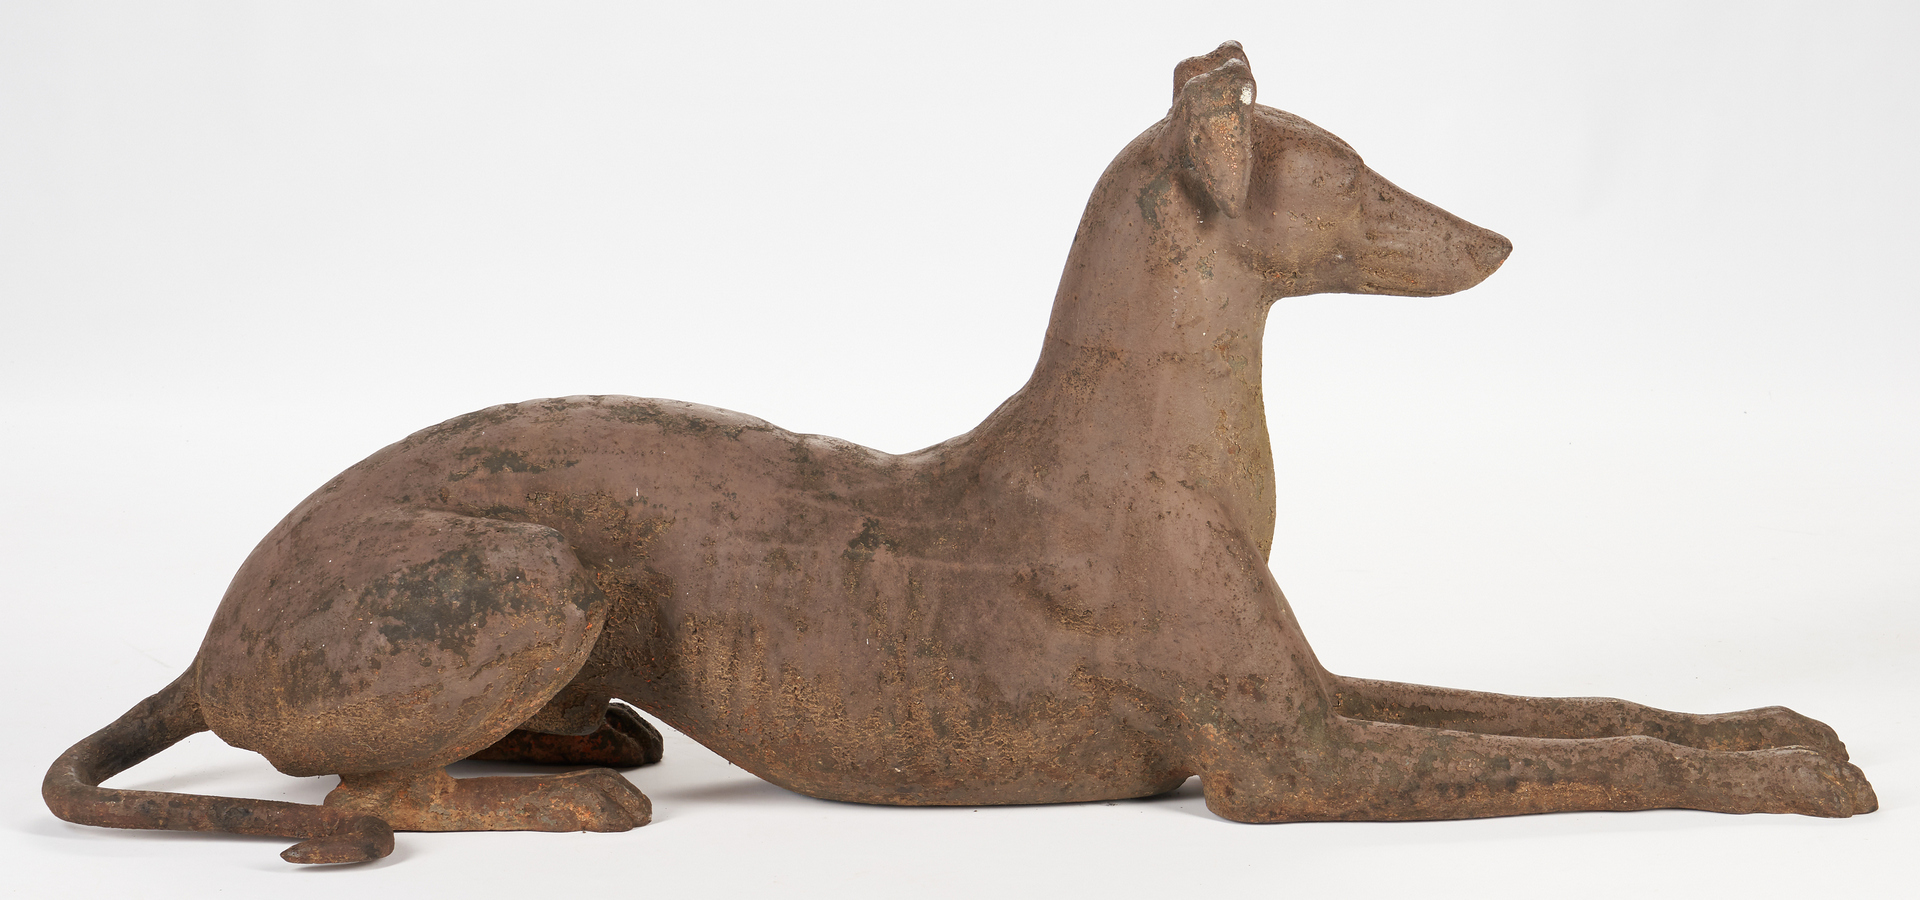 Lot 405: Large Cast Iron Greyhound, attr. J.W. Fiske